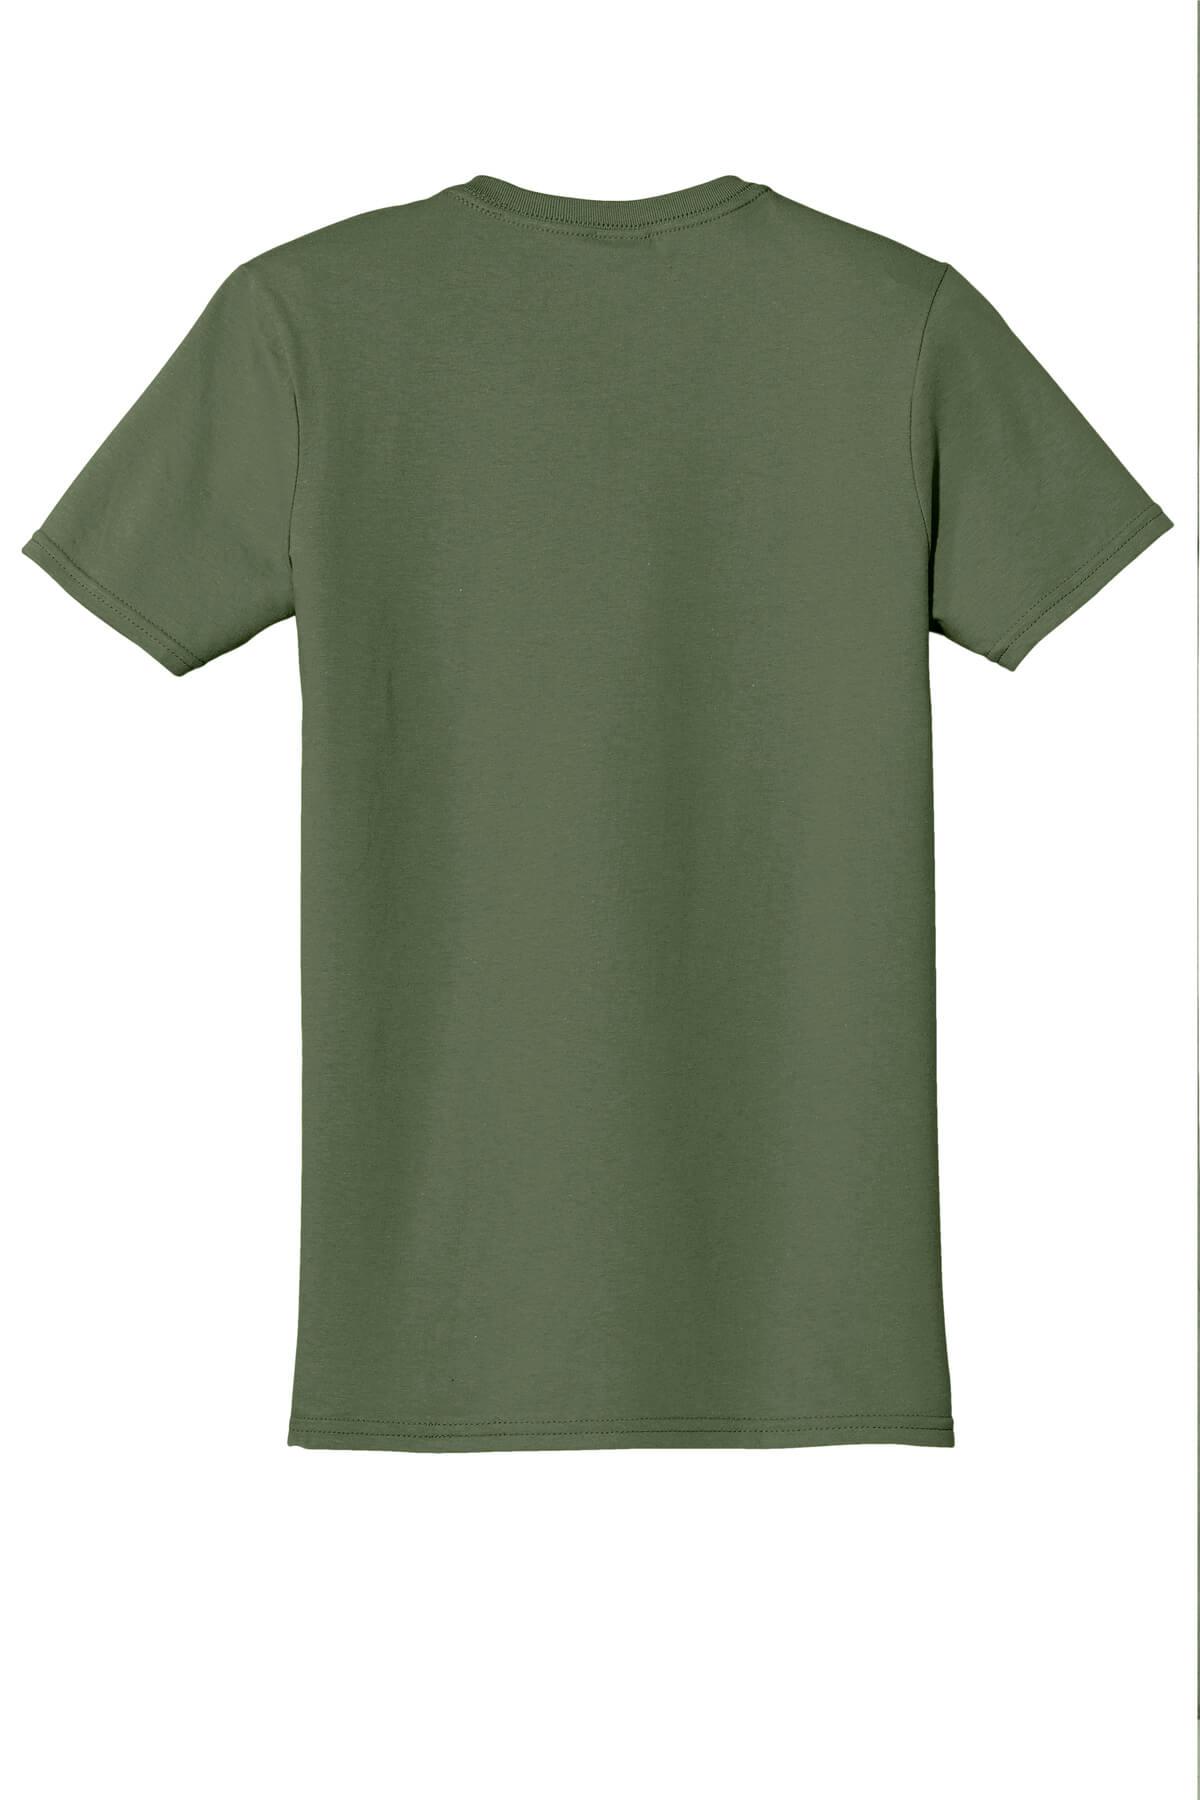 Military Green T-Shirt Back